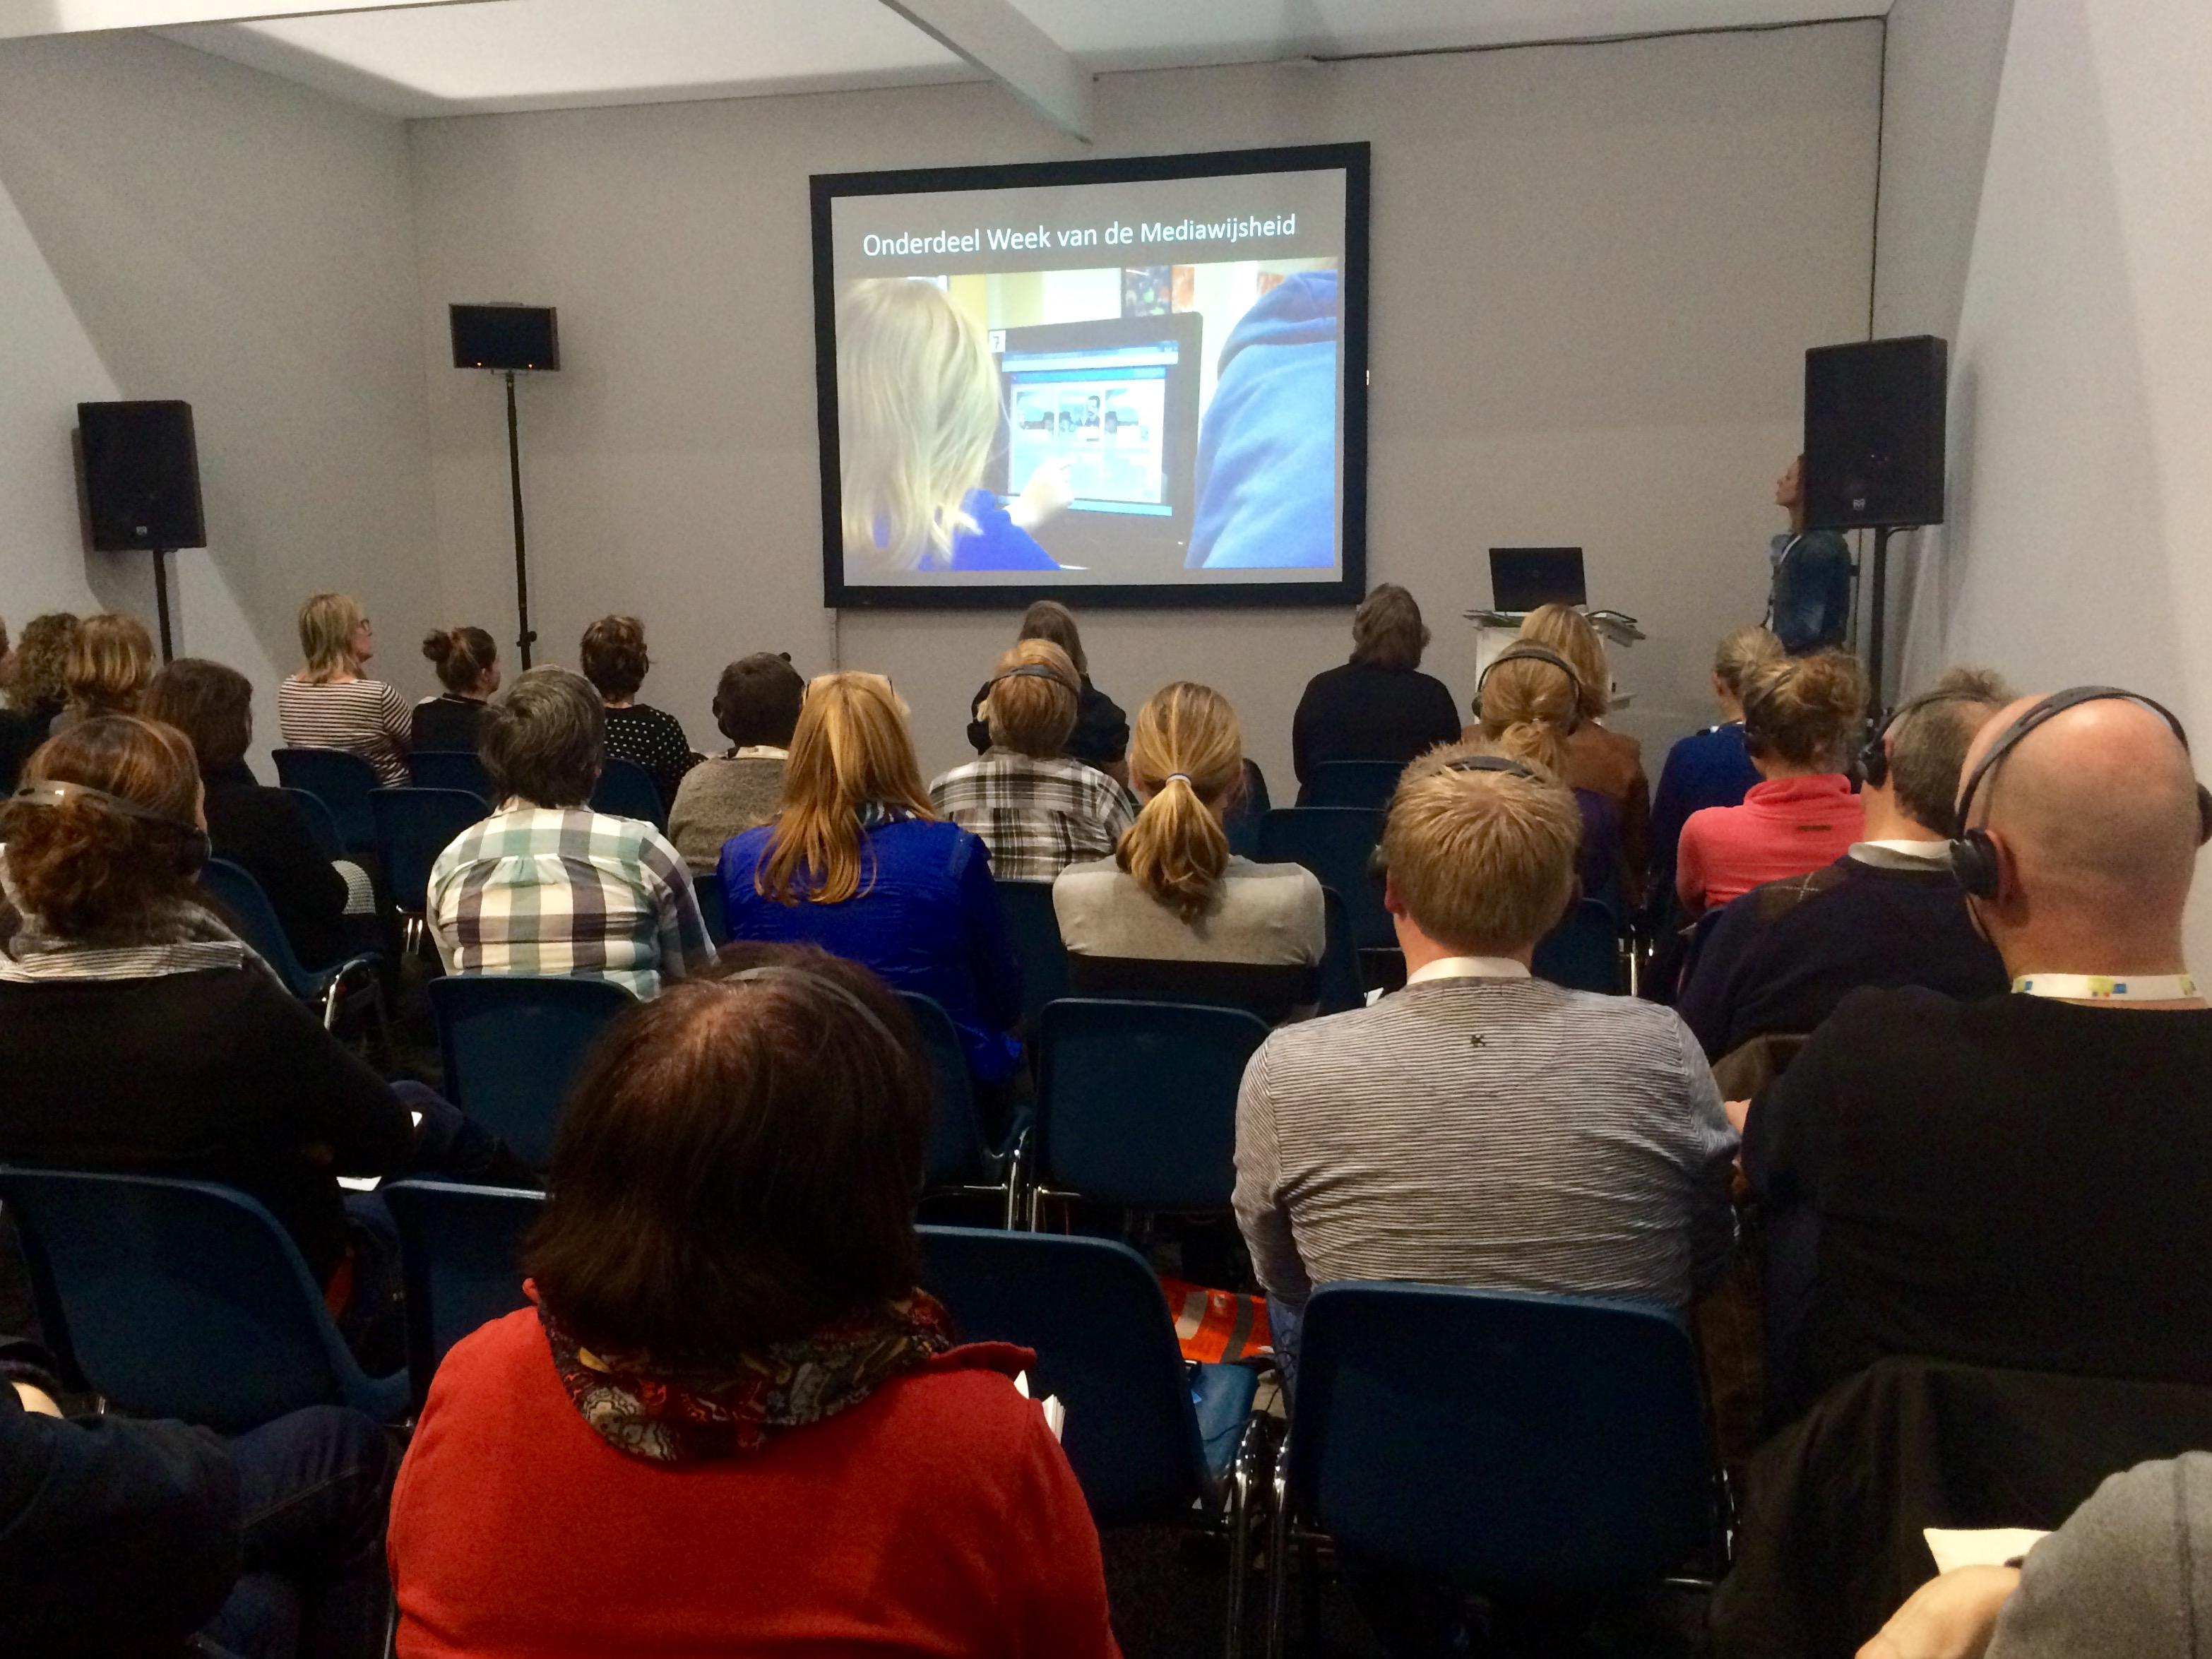 seminar sessie Mediawijzer.net NOT 2015 MediaMasters Week van de Mediawijsheid Ontdekmedia